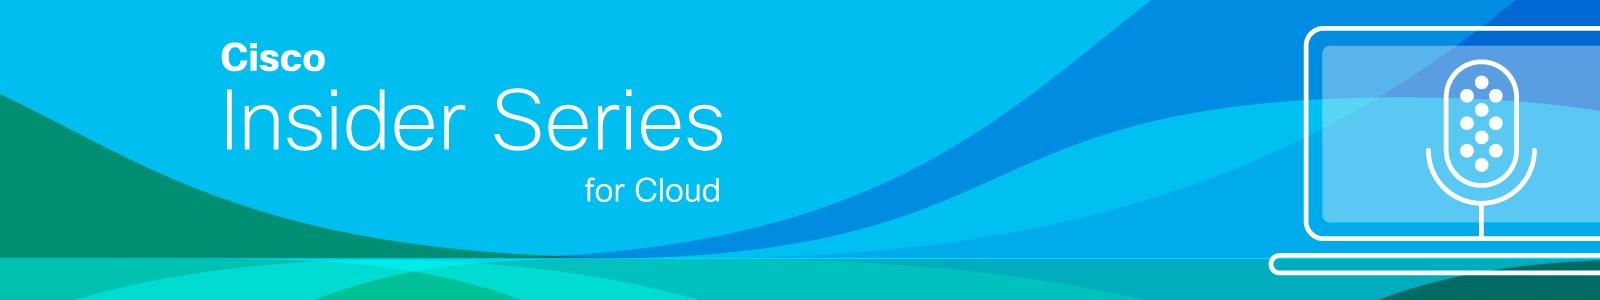 Cisco Insider Series for Cloud